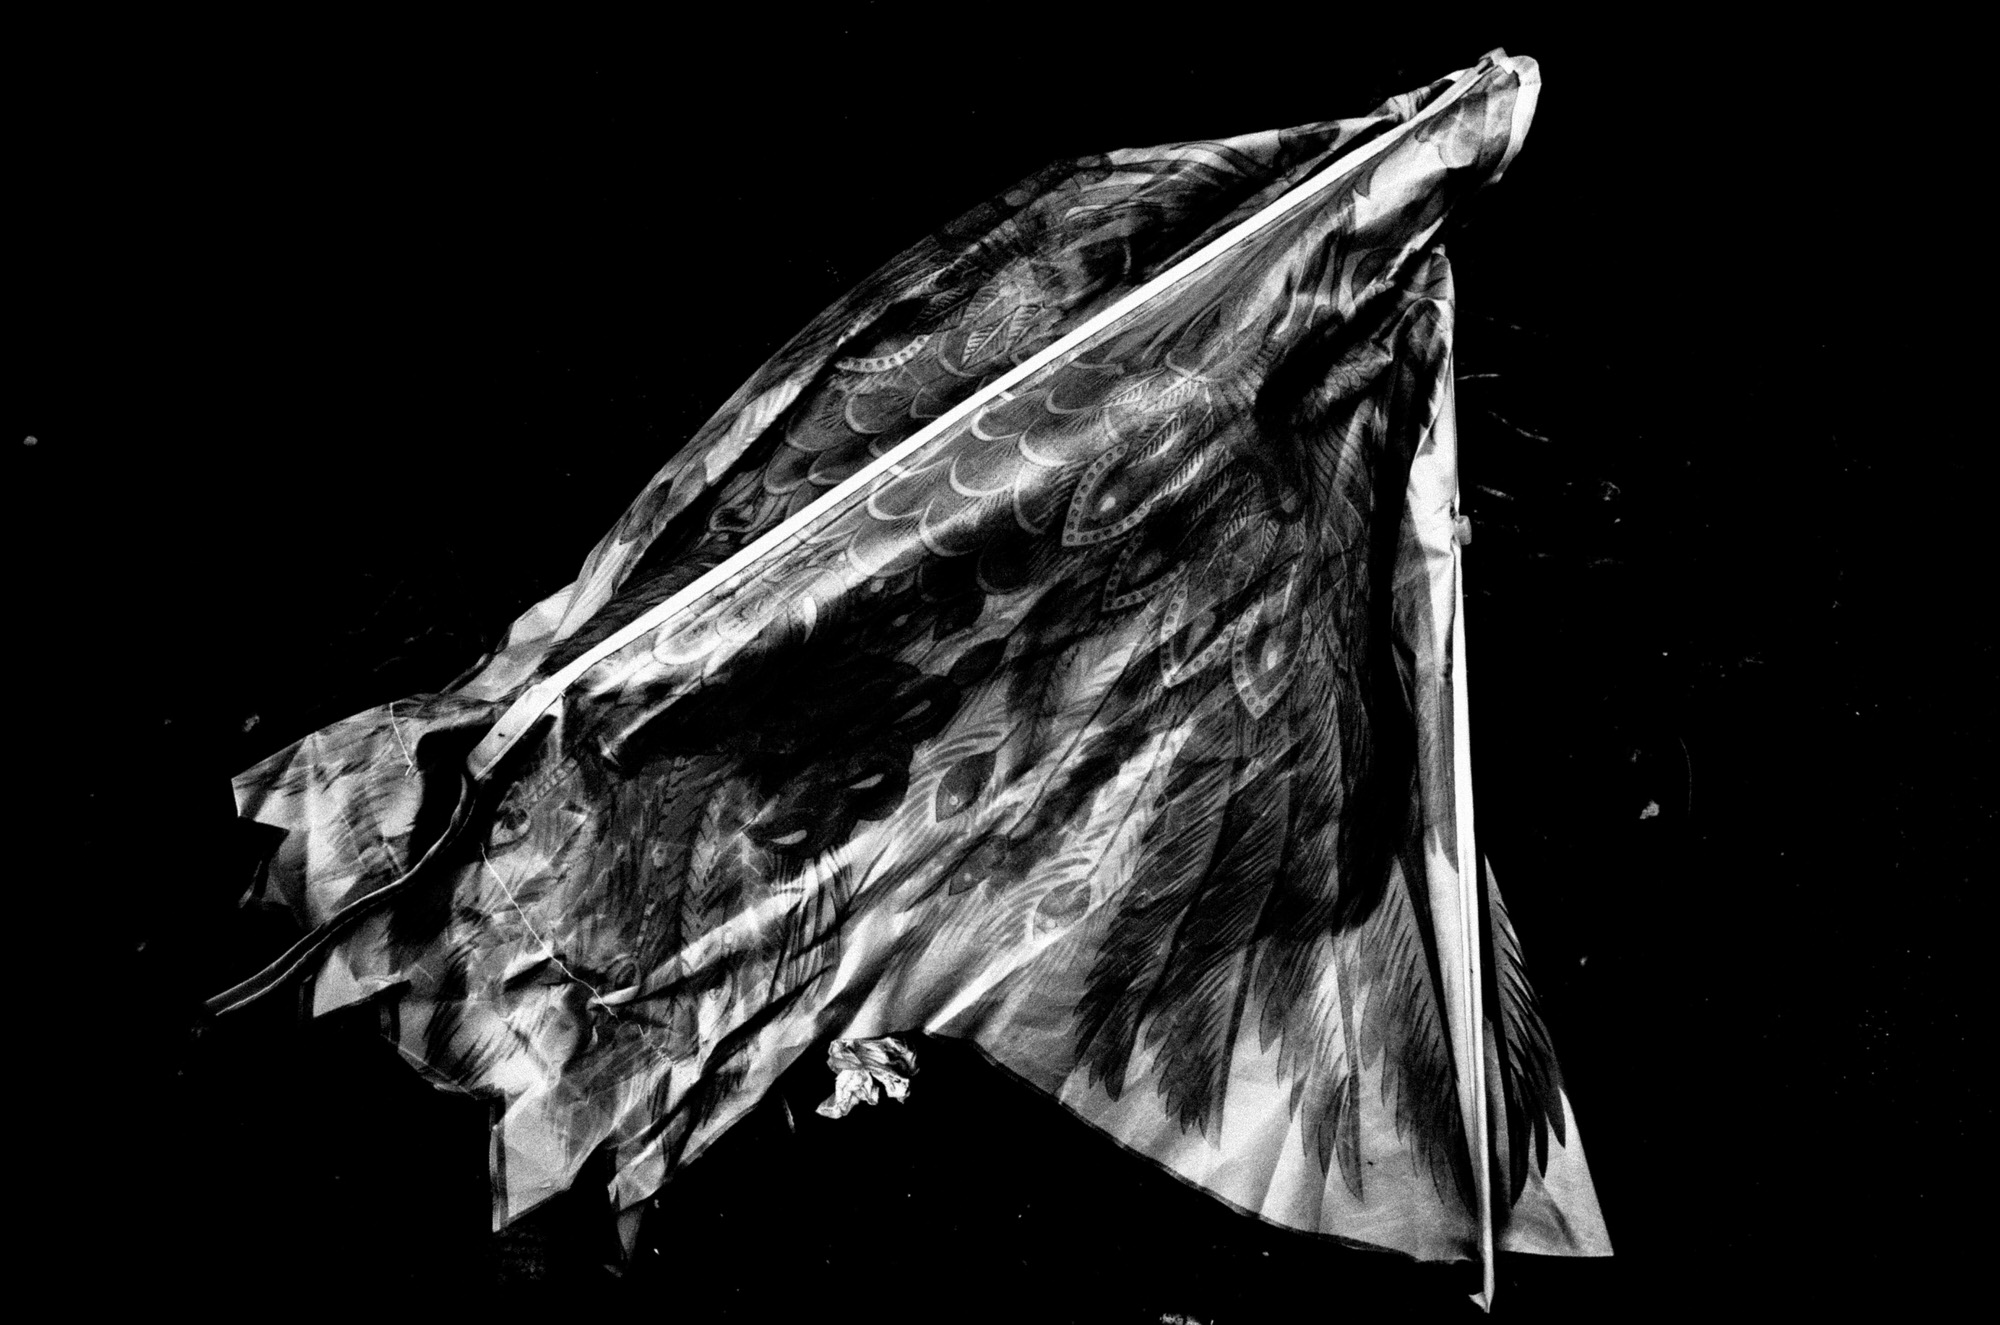 eric kim photography black and white - eric kim photography black and white hanoi-0009761